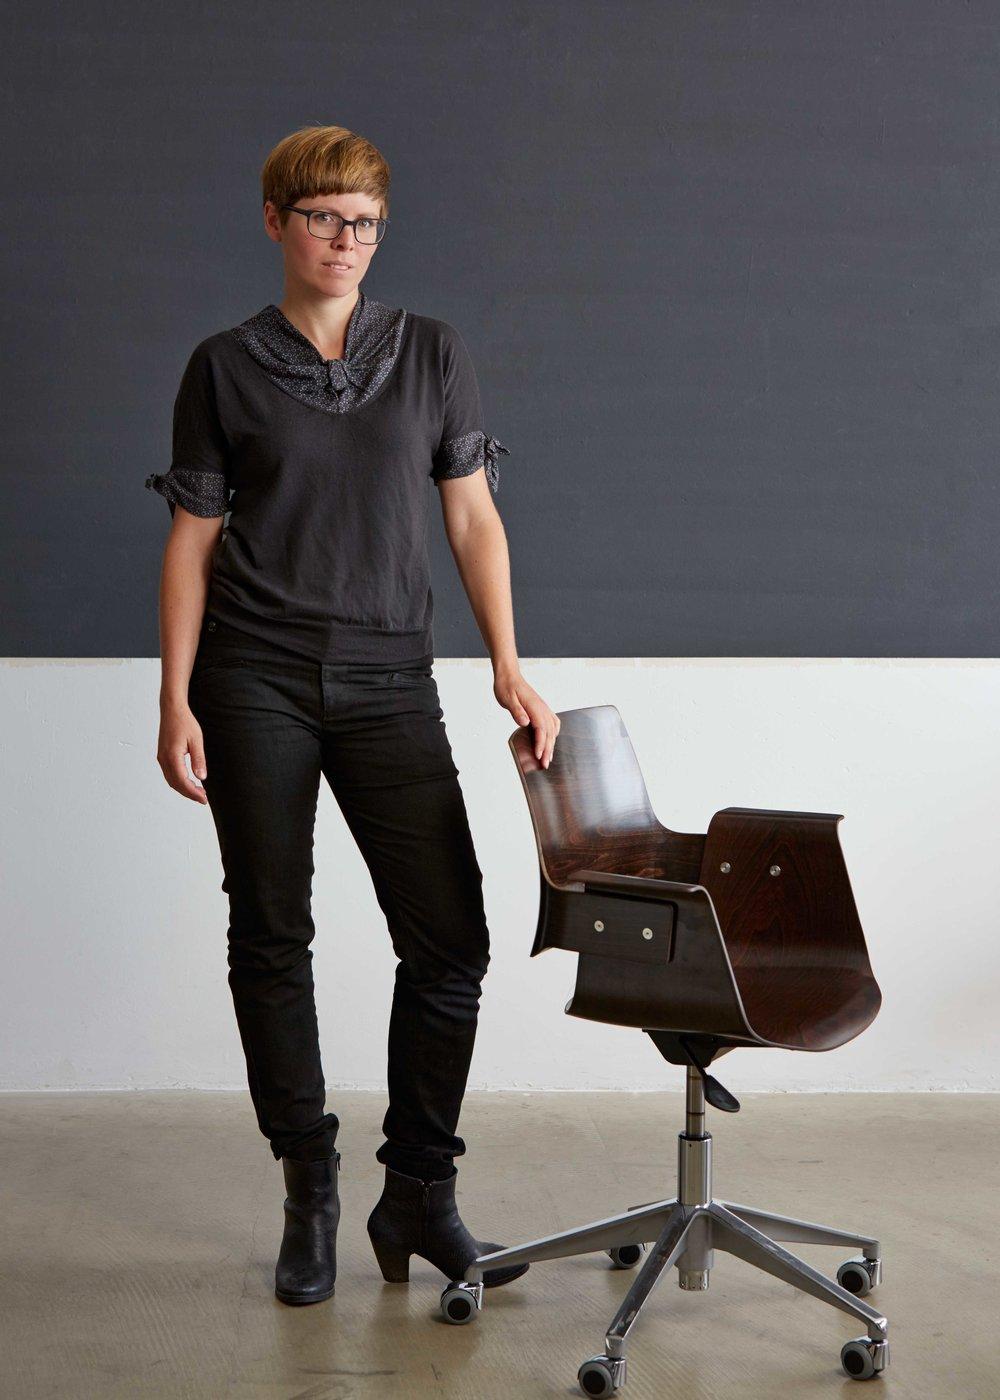 Anja Meyer - dipl. arch. ETHZ SIA SWBmail